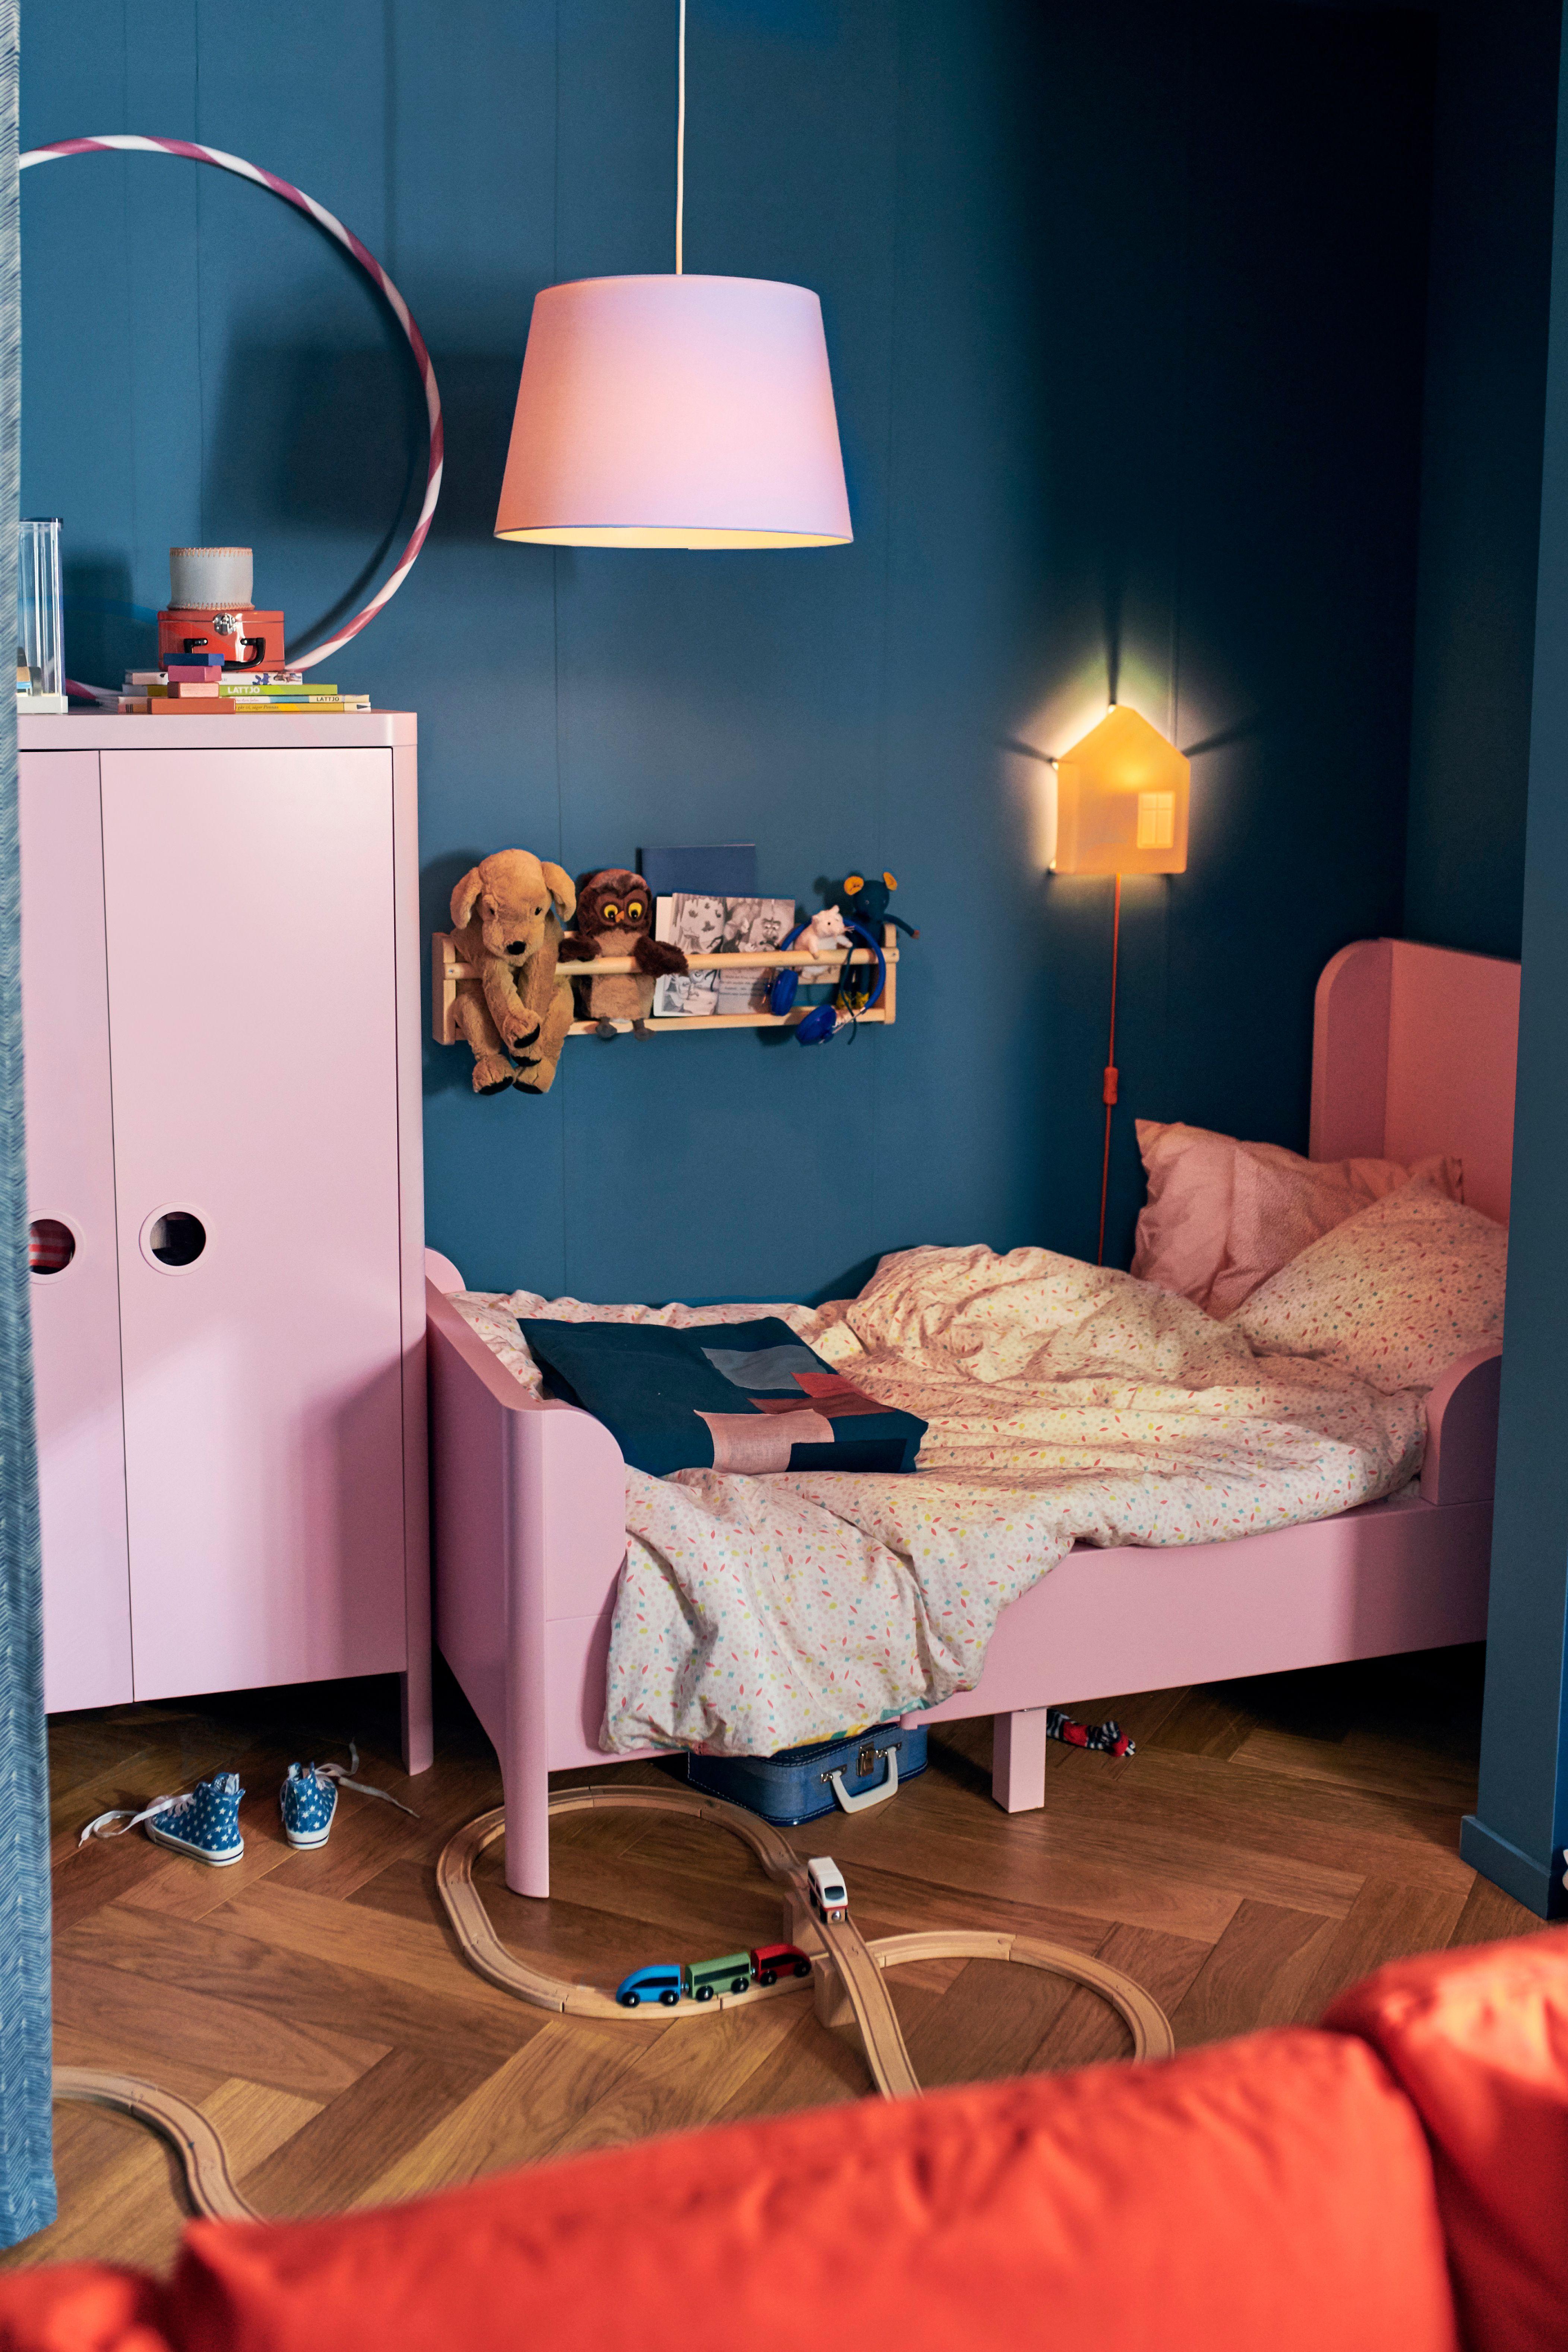 Busunge Bettgestell Ausziehbar Hellrosa Ikea Deutschland